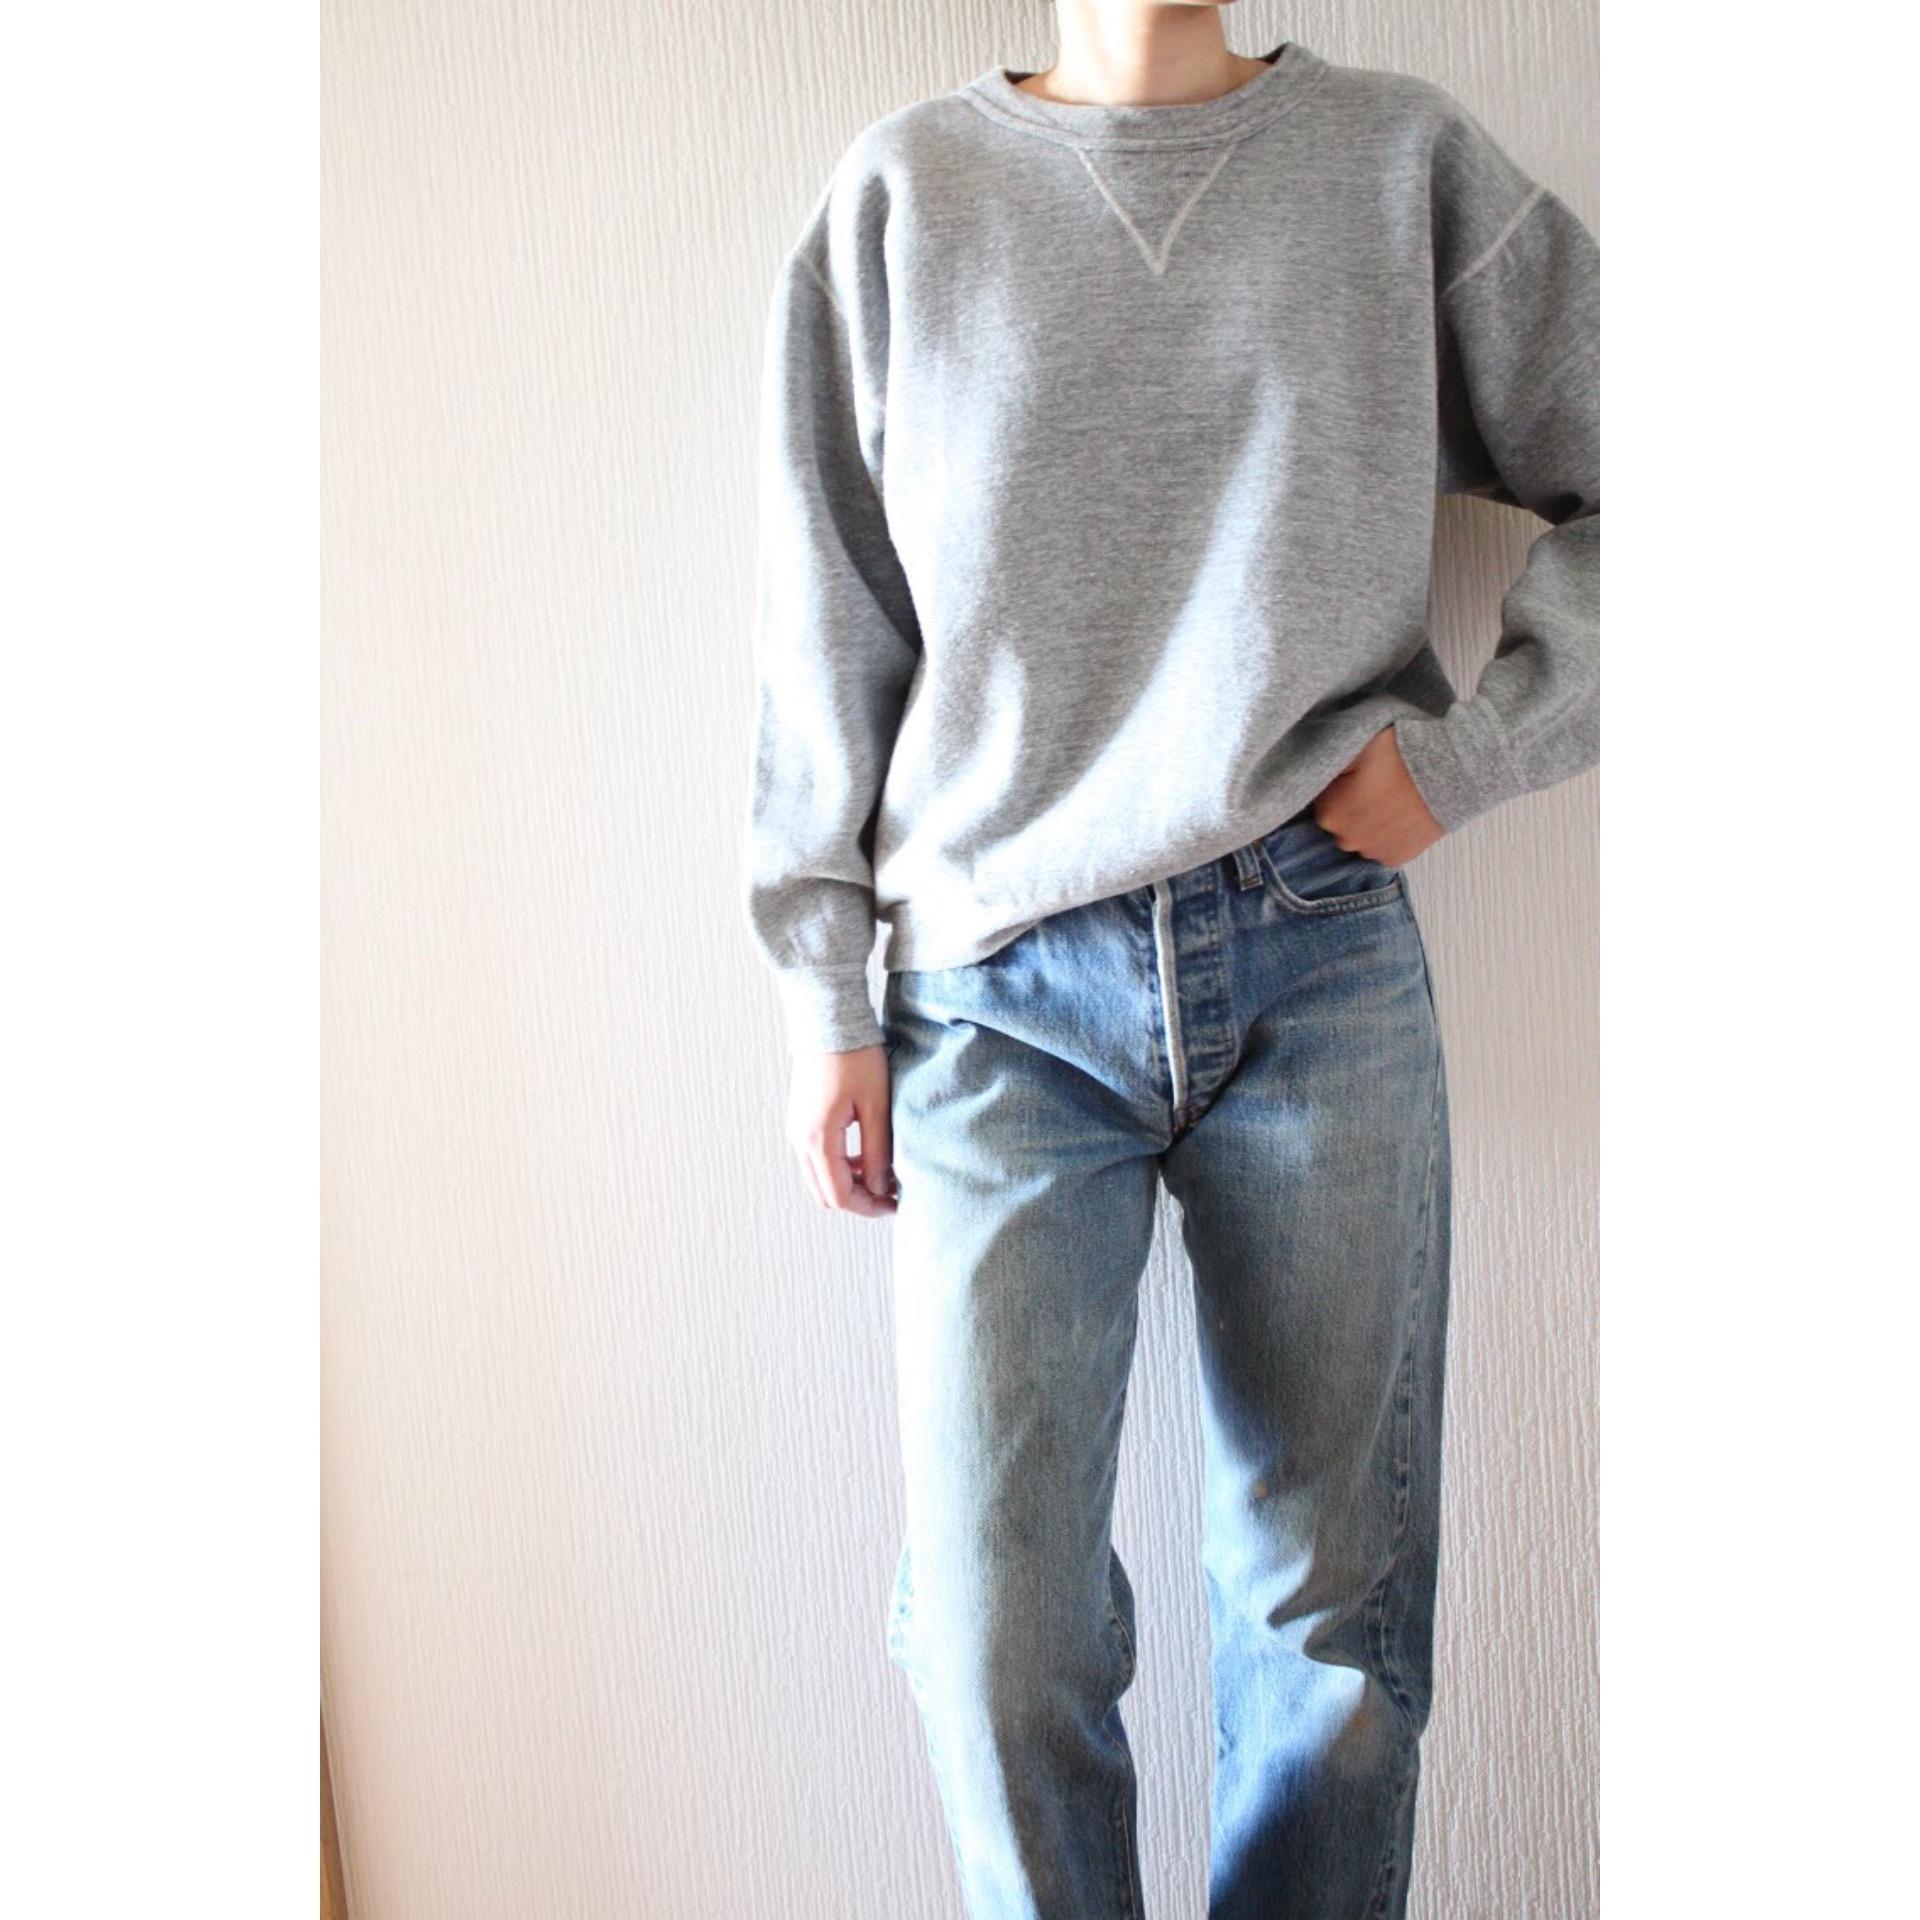 60s Vintage sweater size L